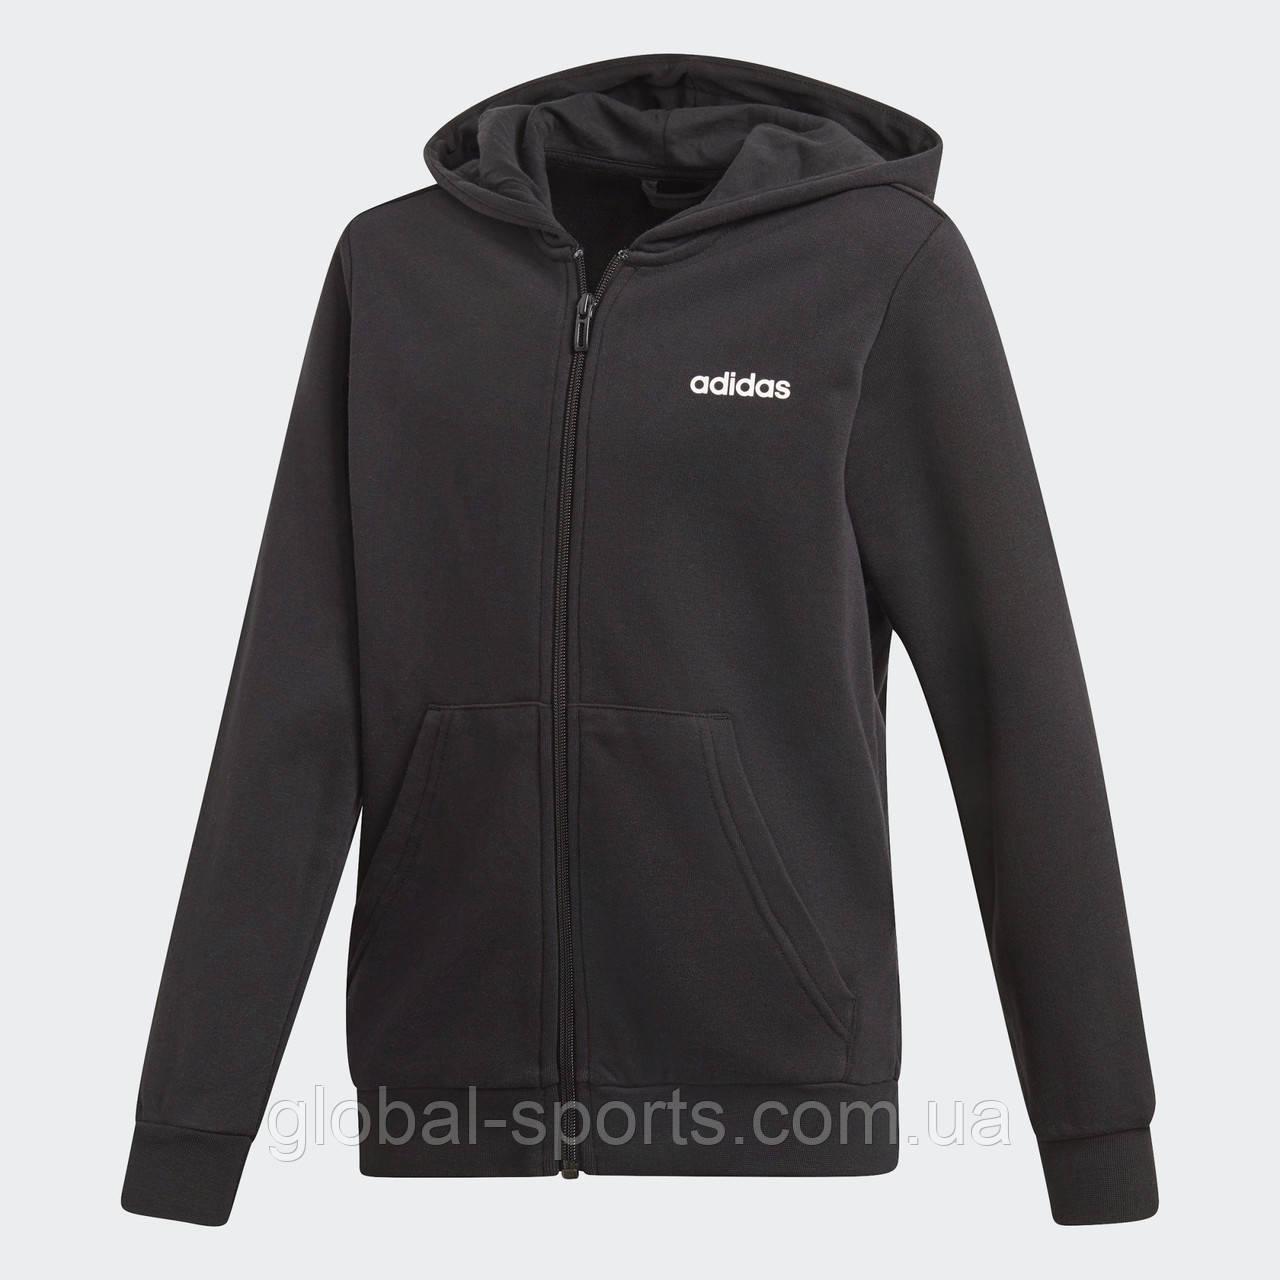 Дитяча толстовка Adidas YB LIN E FZ HD(Артикул:DV1792)